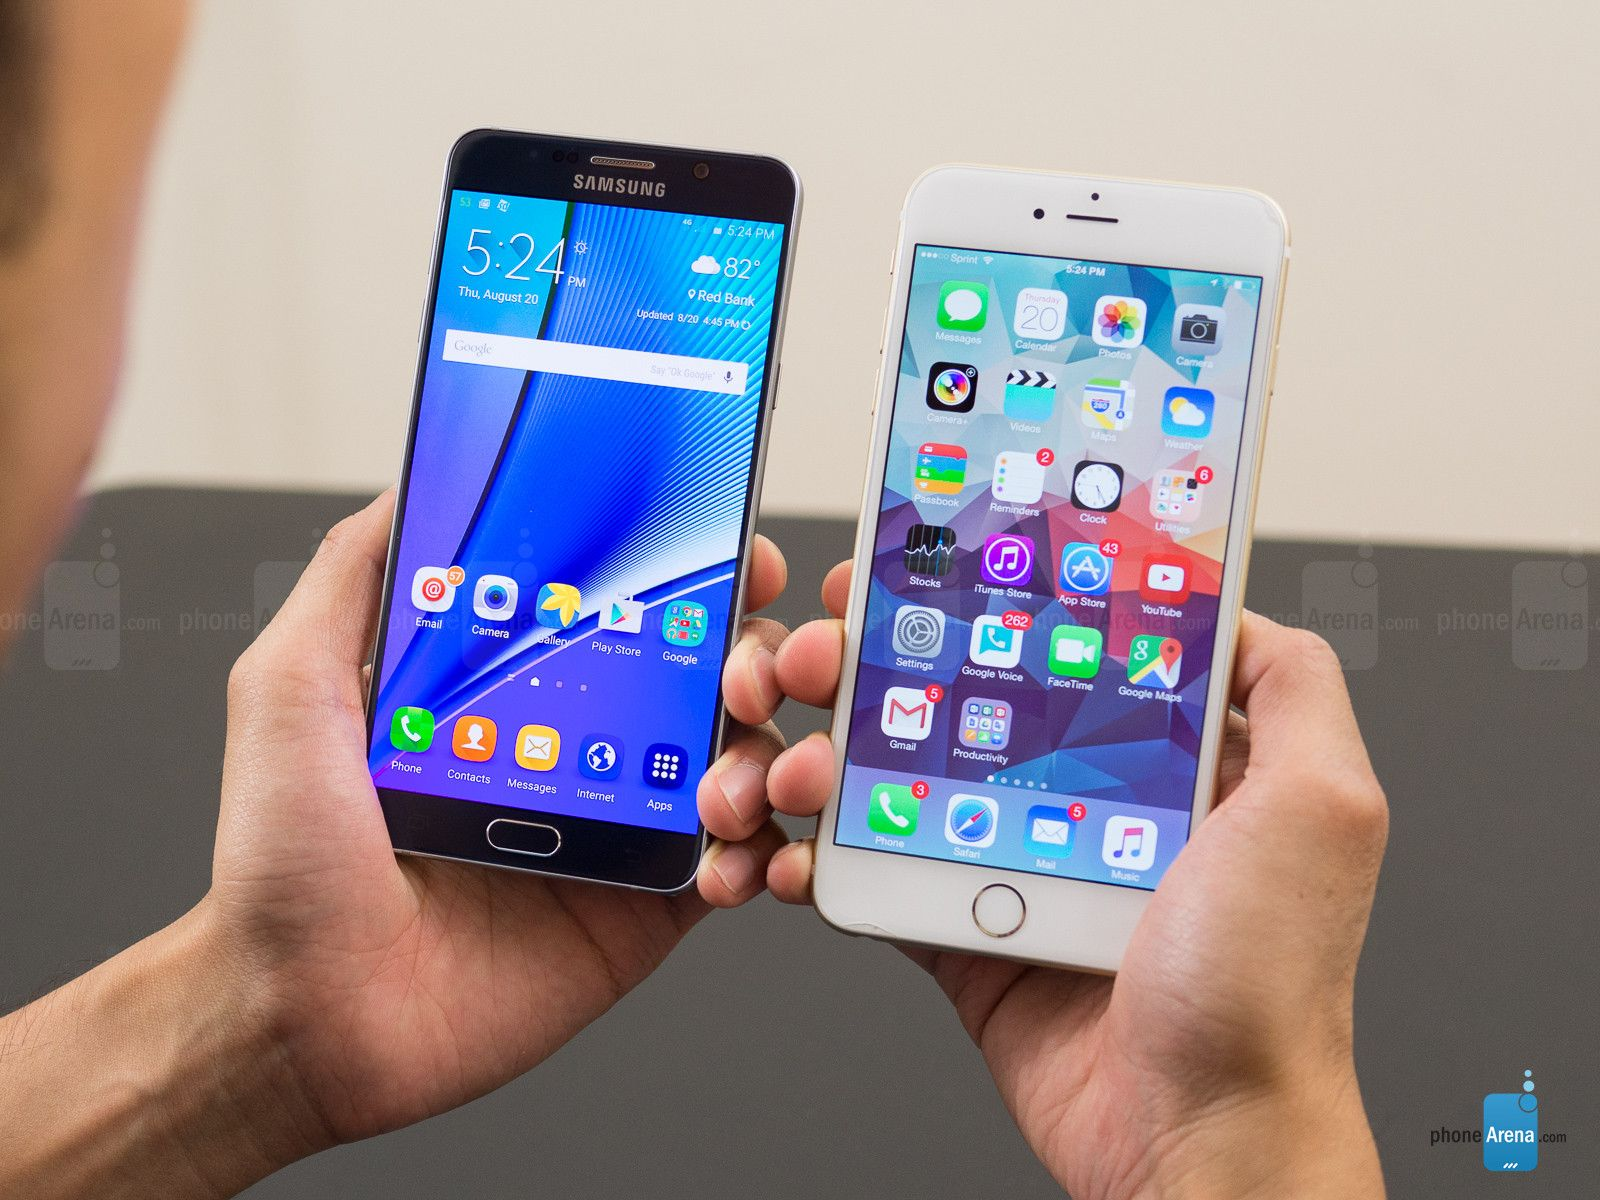 Samsung-Galaxy-Note5-vs-Apple-iPhone-6-Plus-22